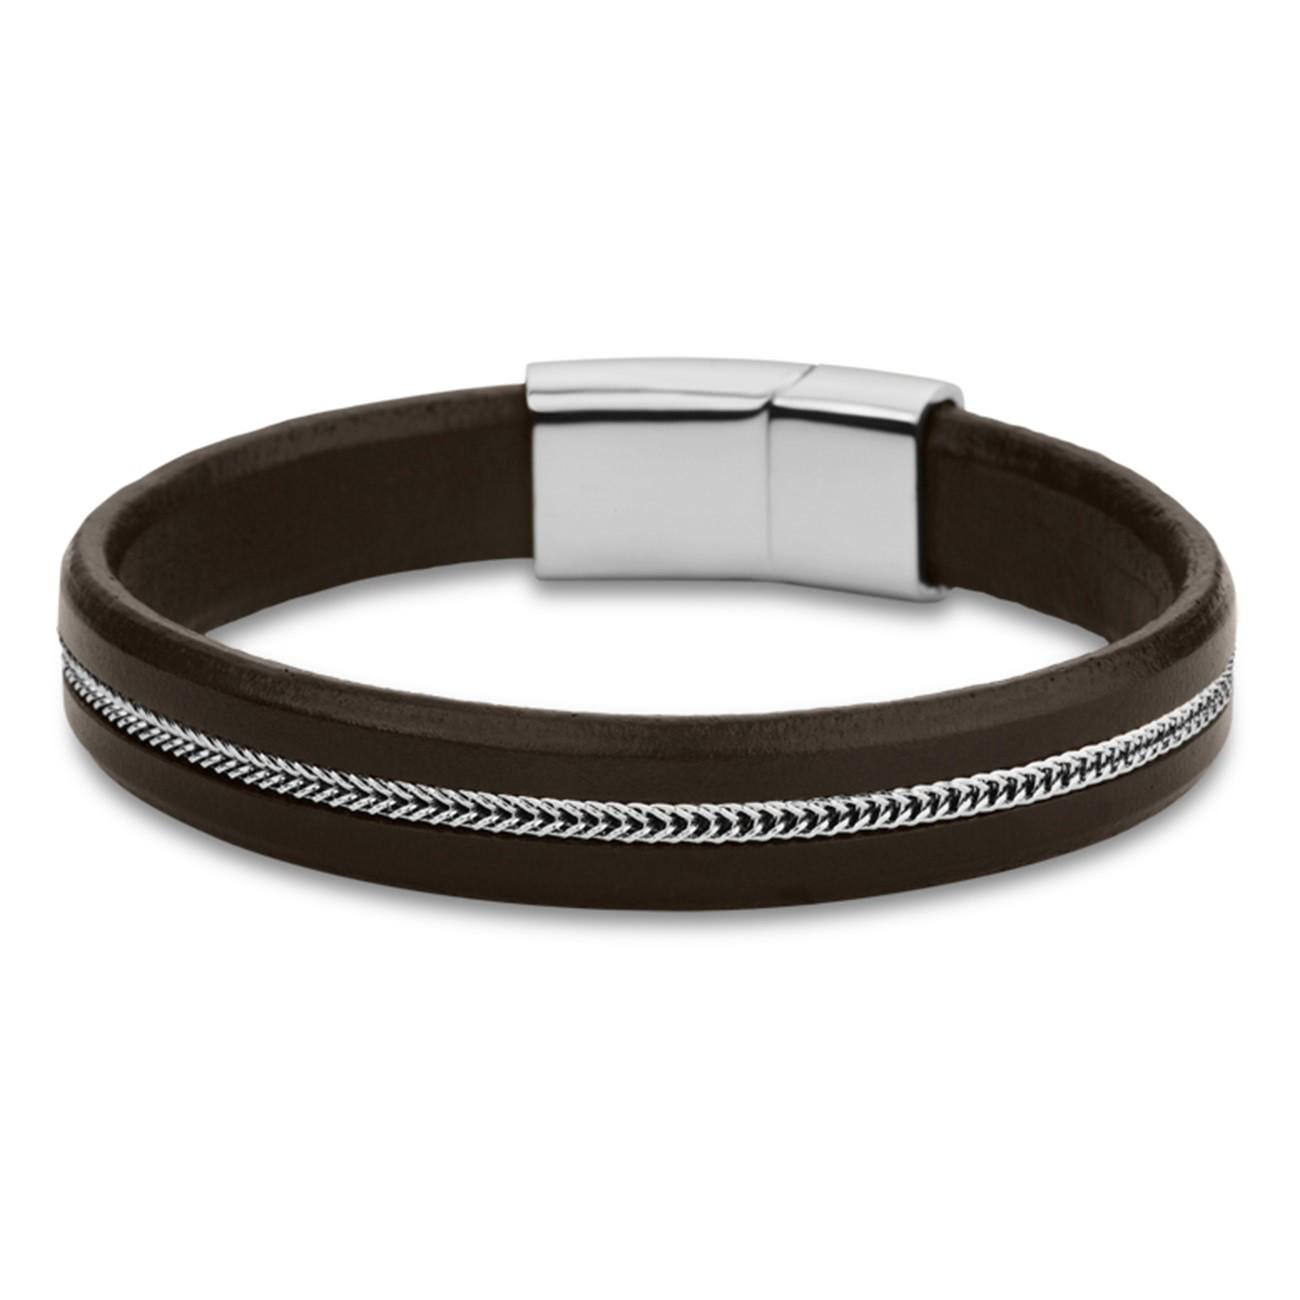 LOTUS Style Armband Herren Leder braun LS1830-2/1 Edelstahl JLS1830-2-1